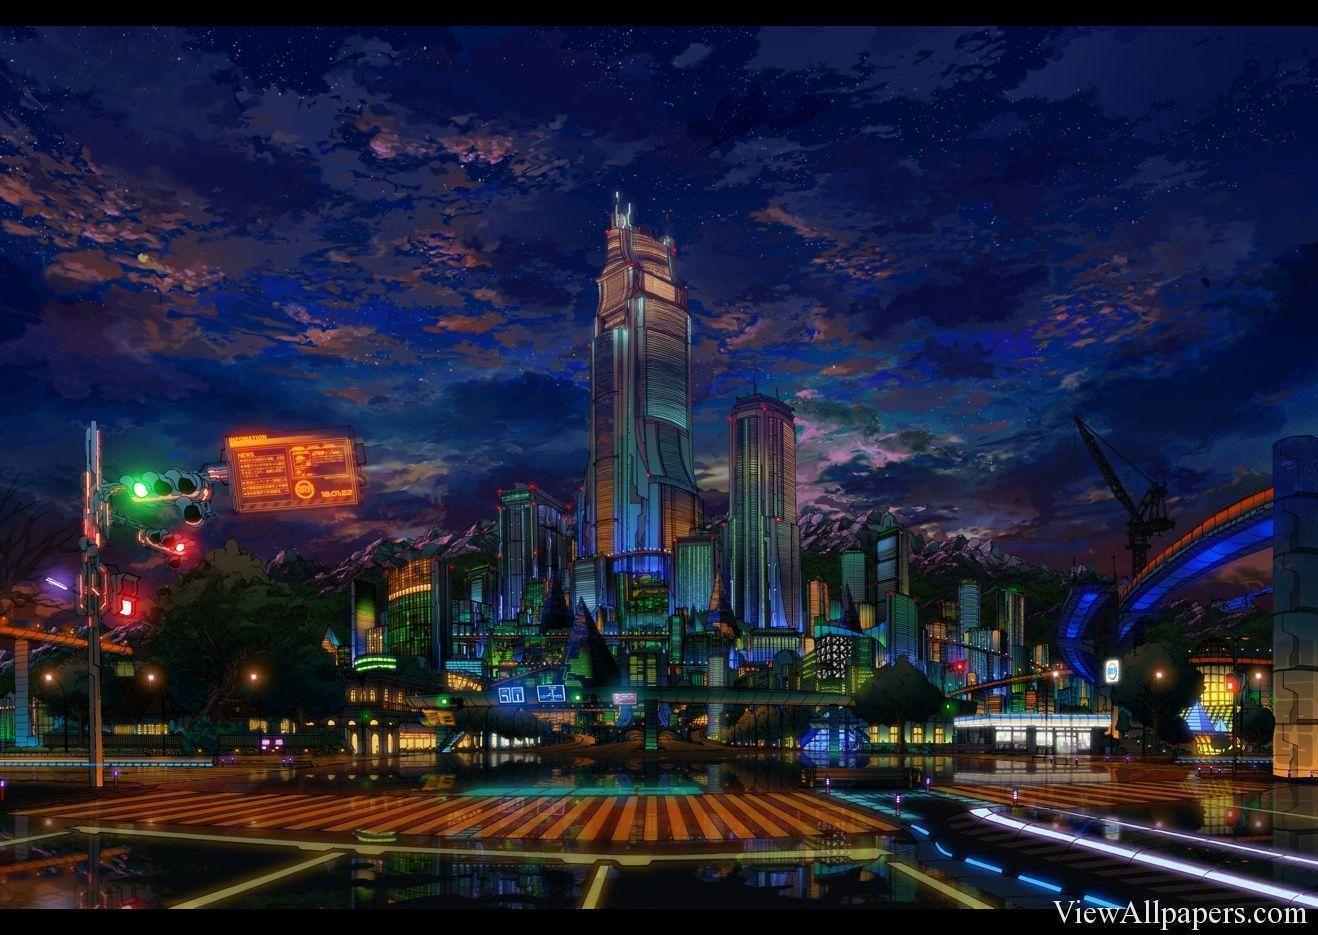 Anime City Night Scenery Wallpapers - Top Free Anime City ...